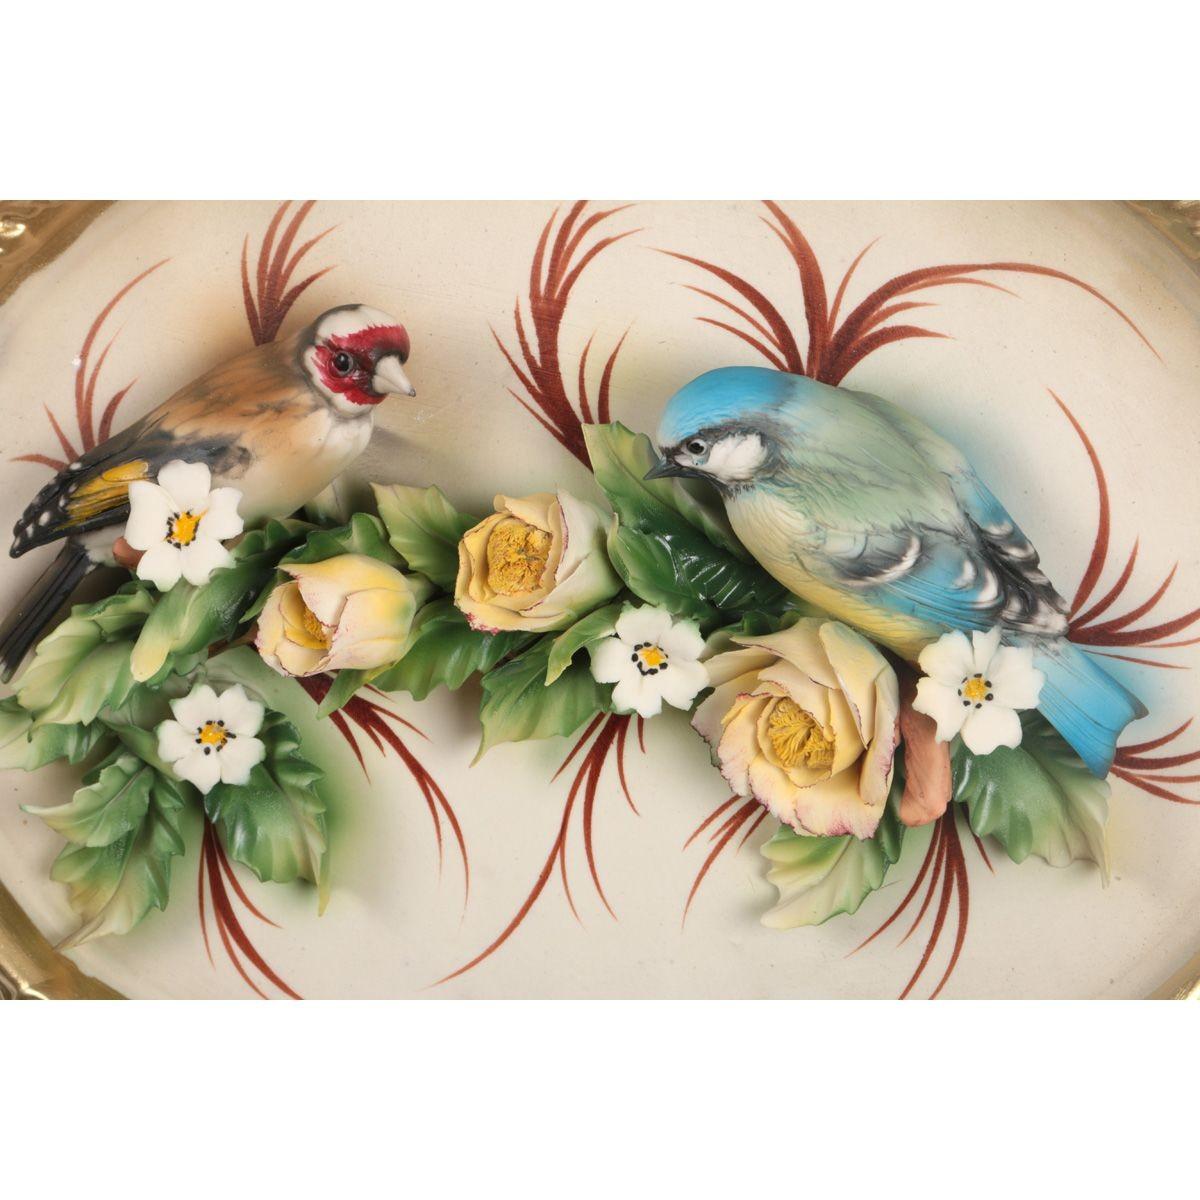 Панно настенное «Пара птиц» Arte Casa (1 штука)